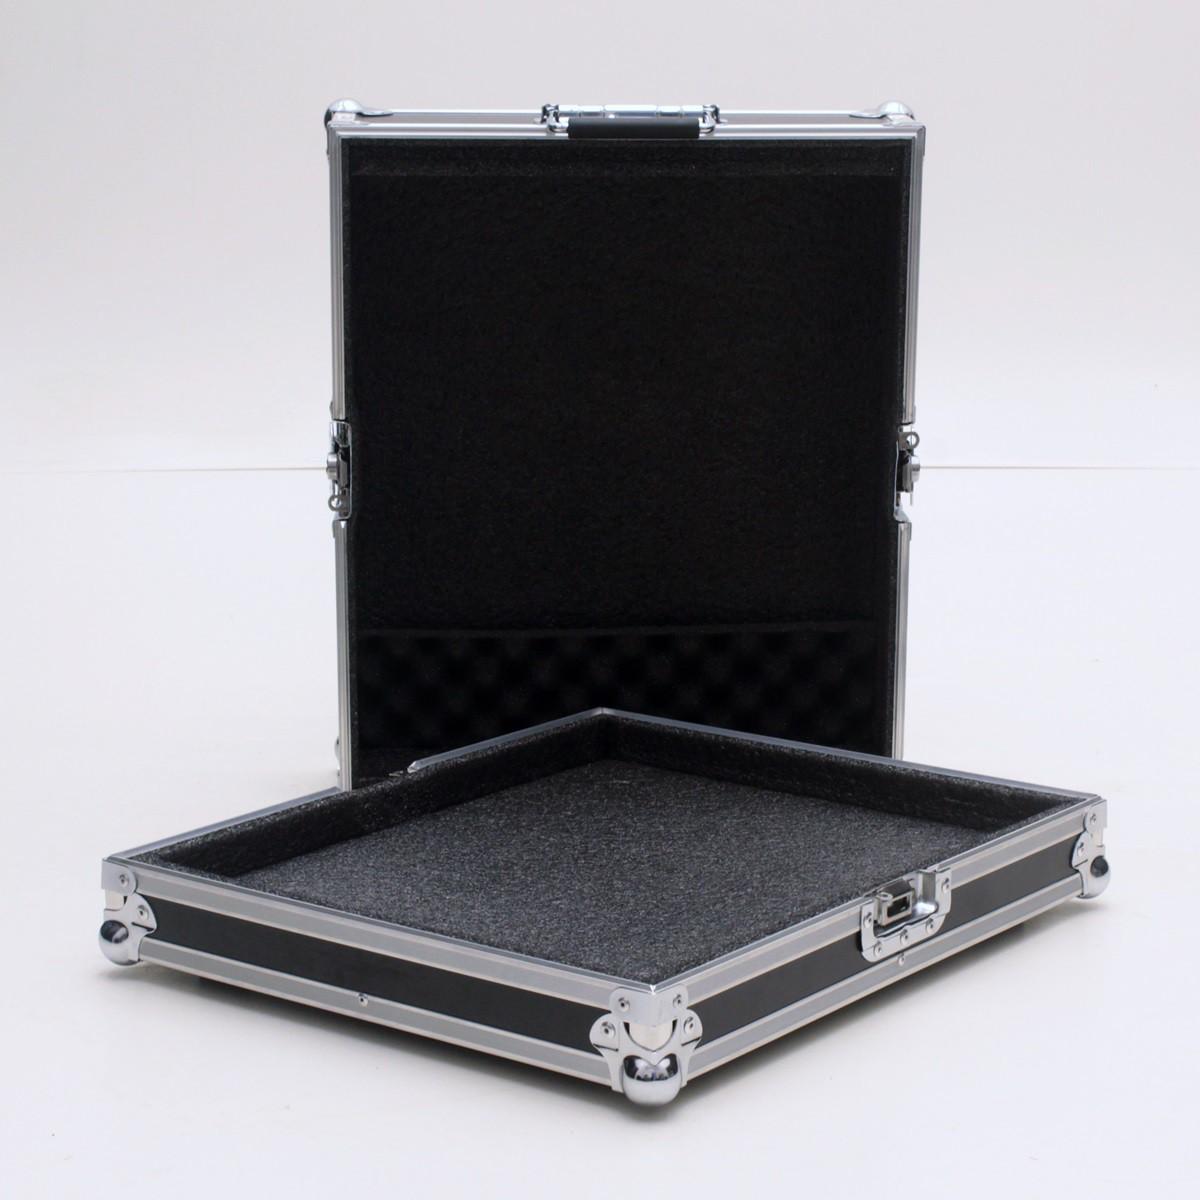 Case Mesa *SEMINOVO* 38x46x12